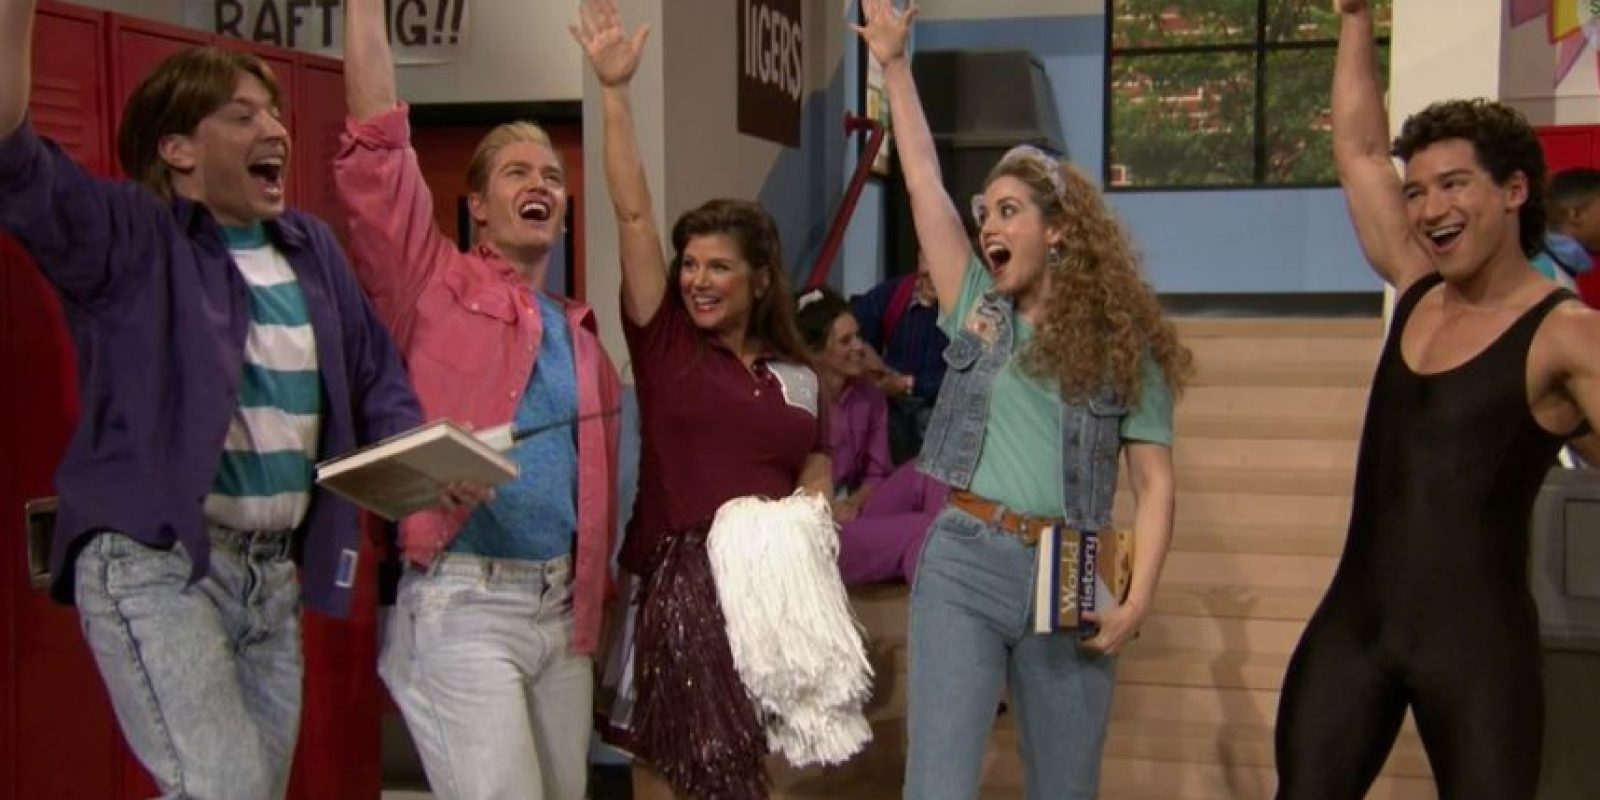 Foto:The Tonight Show Starring Jimmy Fallon